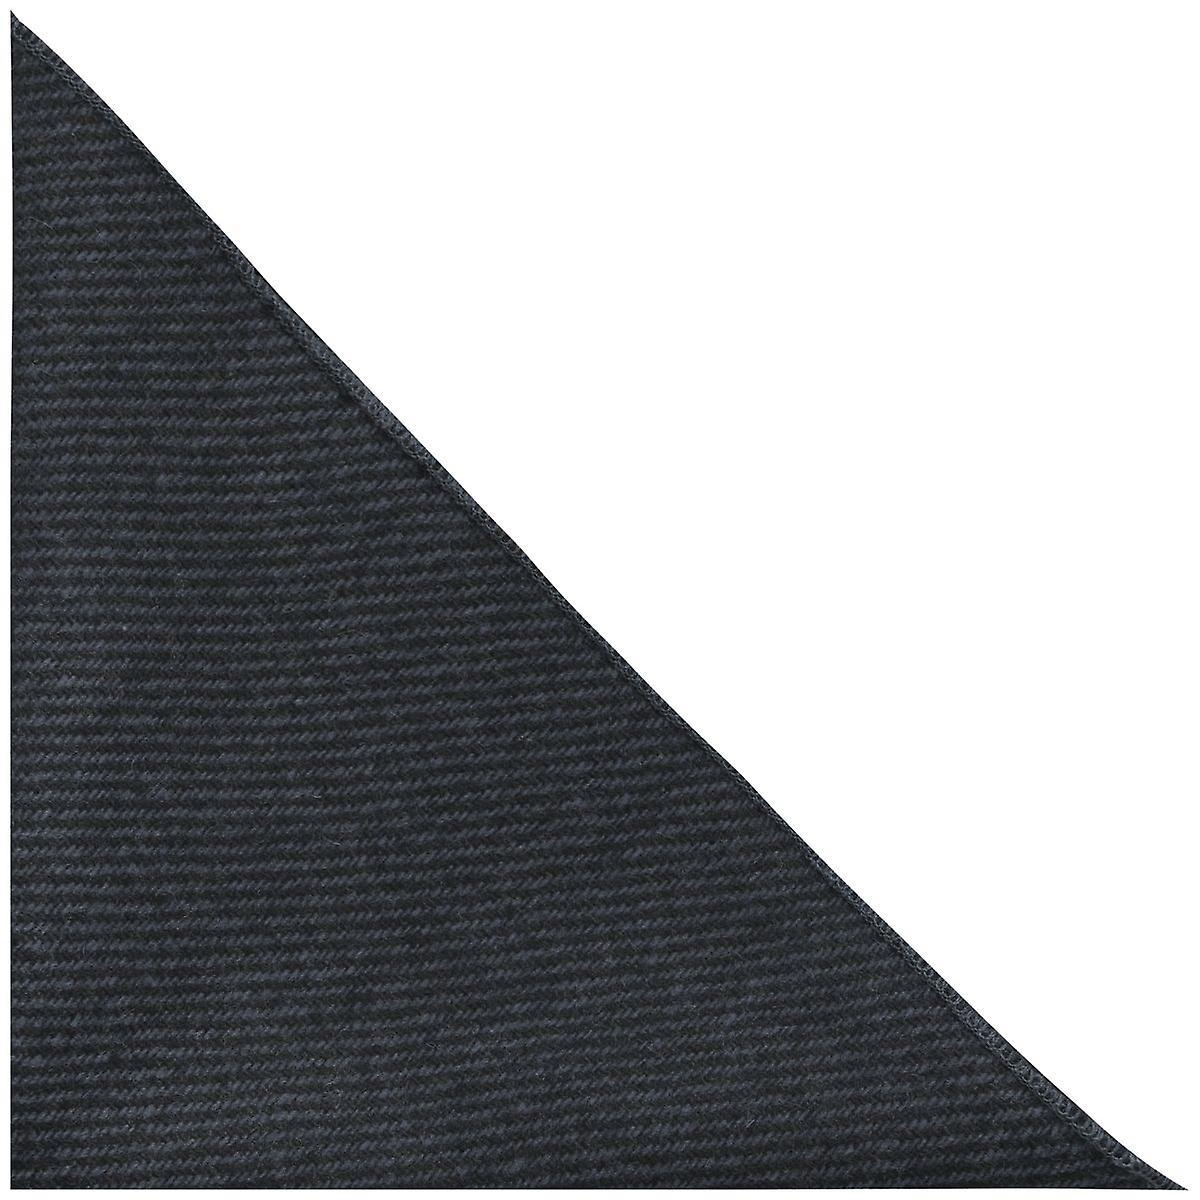 Prussian Blue & Grey Sharkskin Pocket Square, Handkerchief